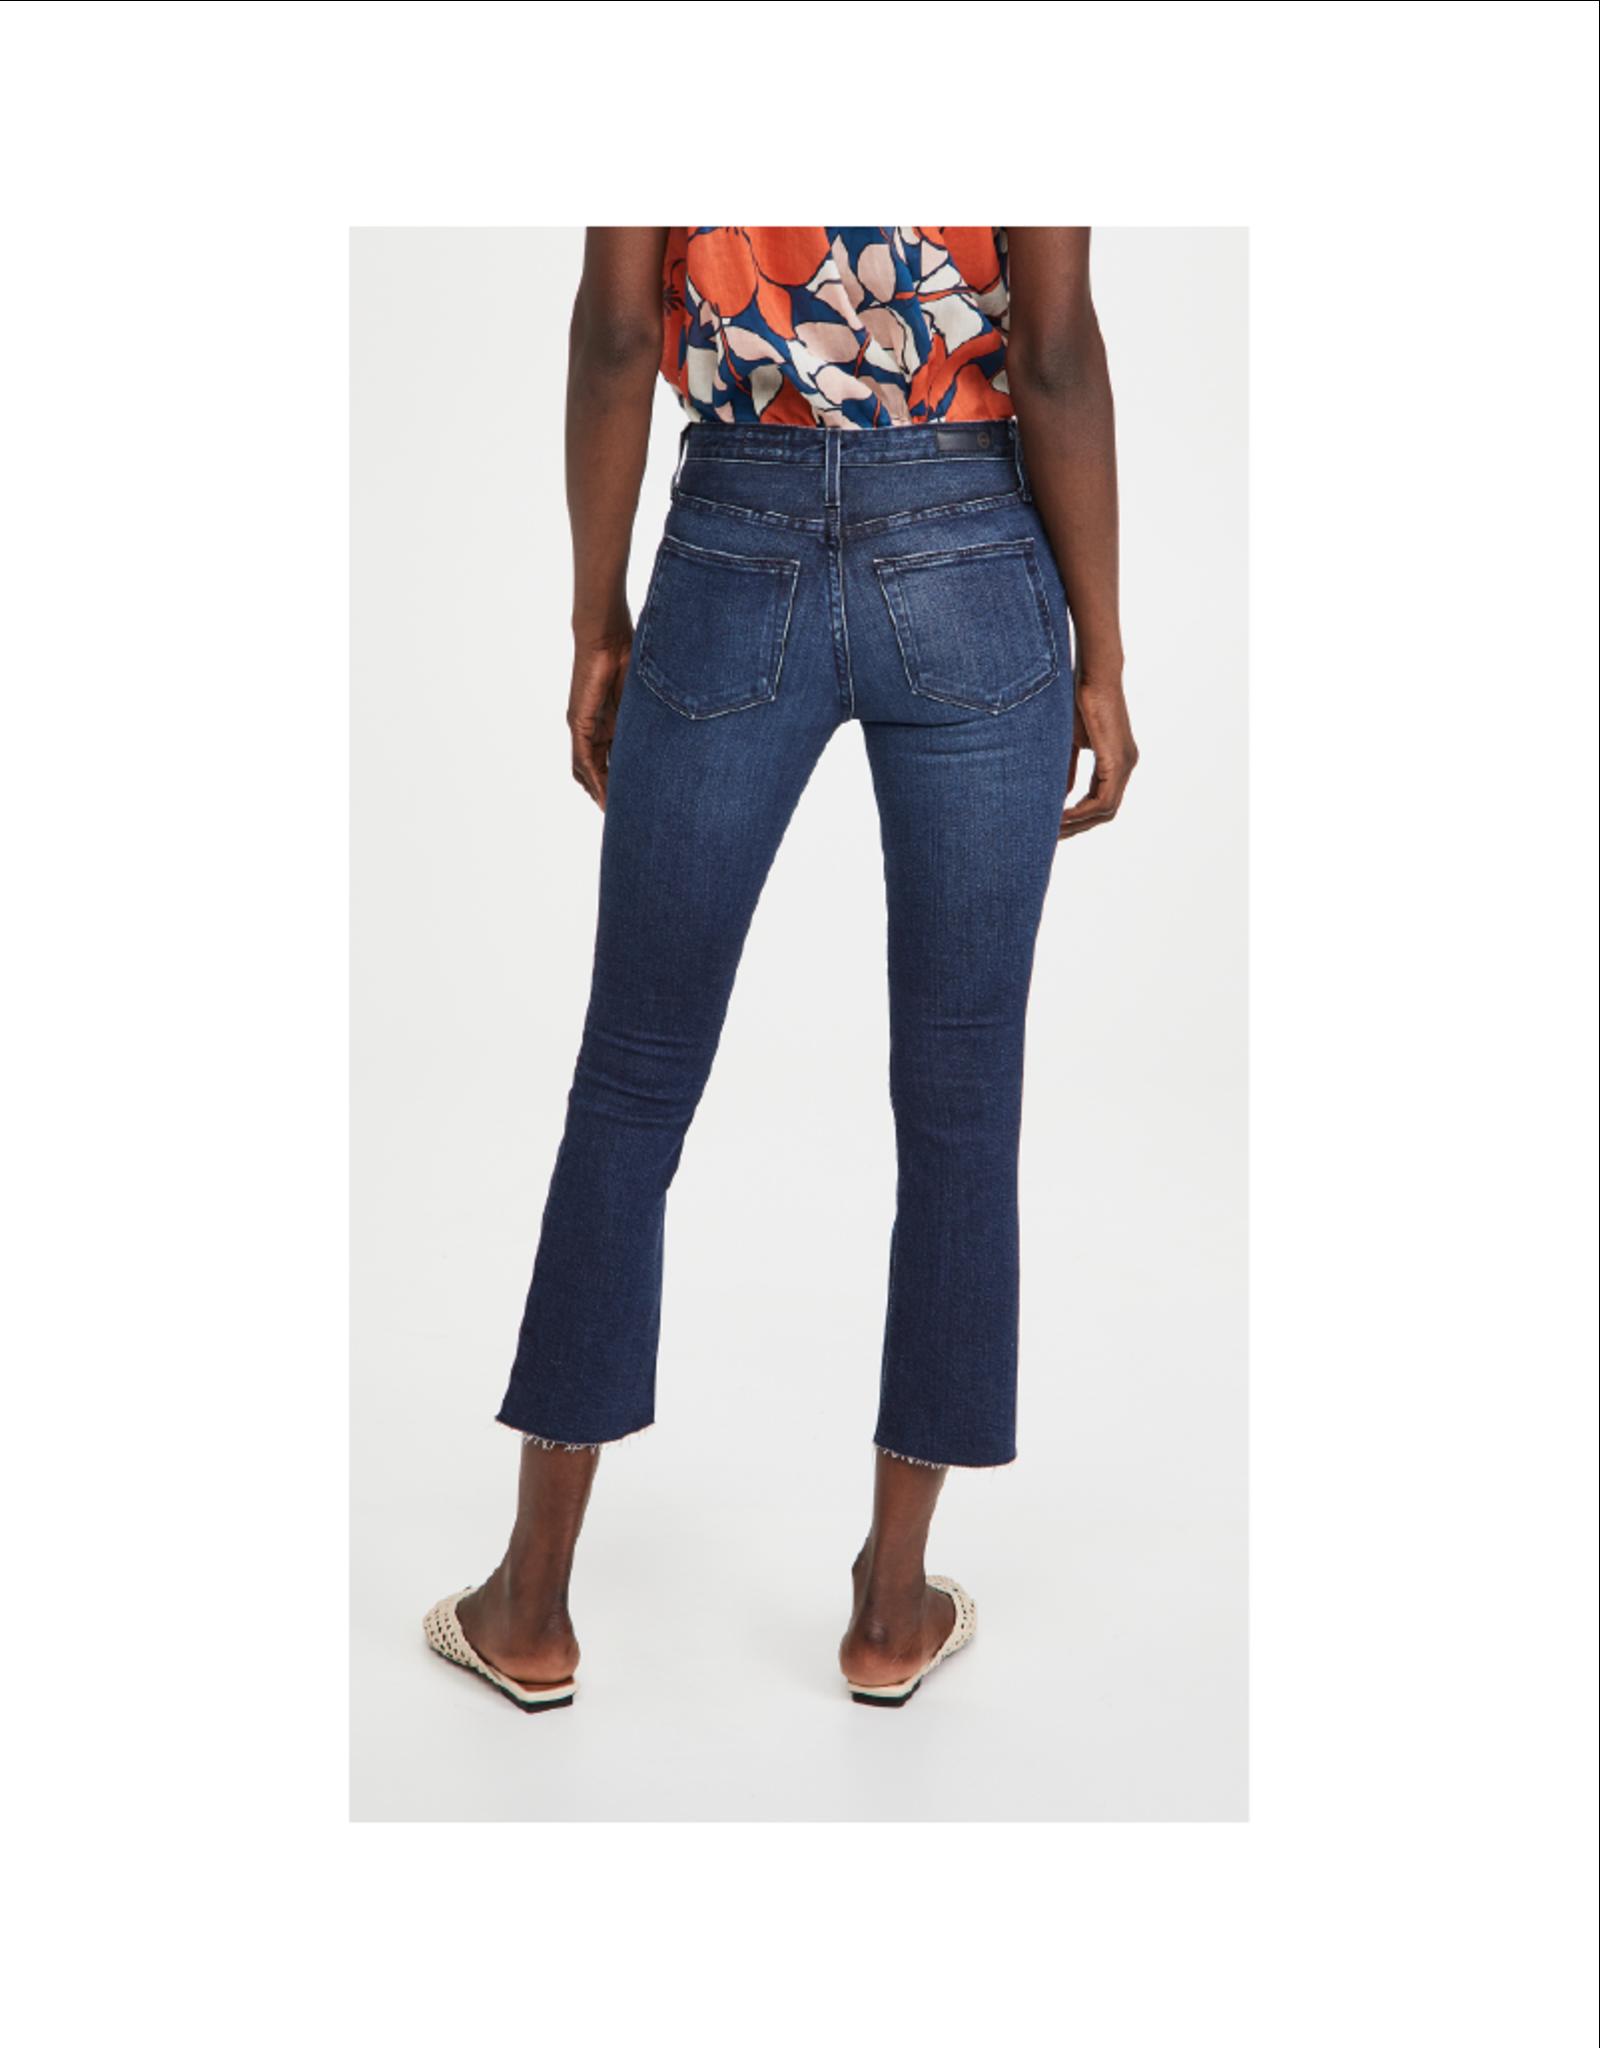 AG Jeans Jodi Crop Santa Rosa